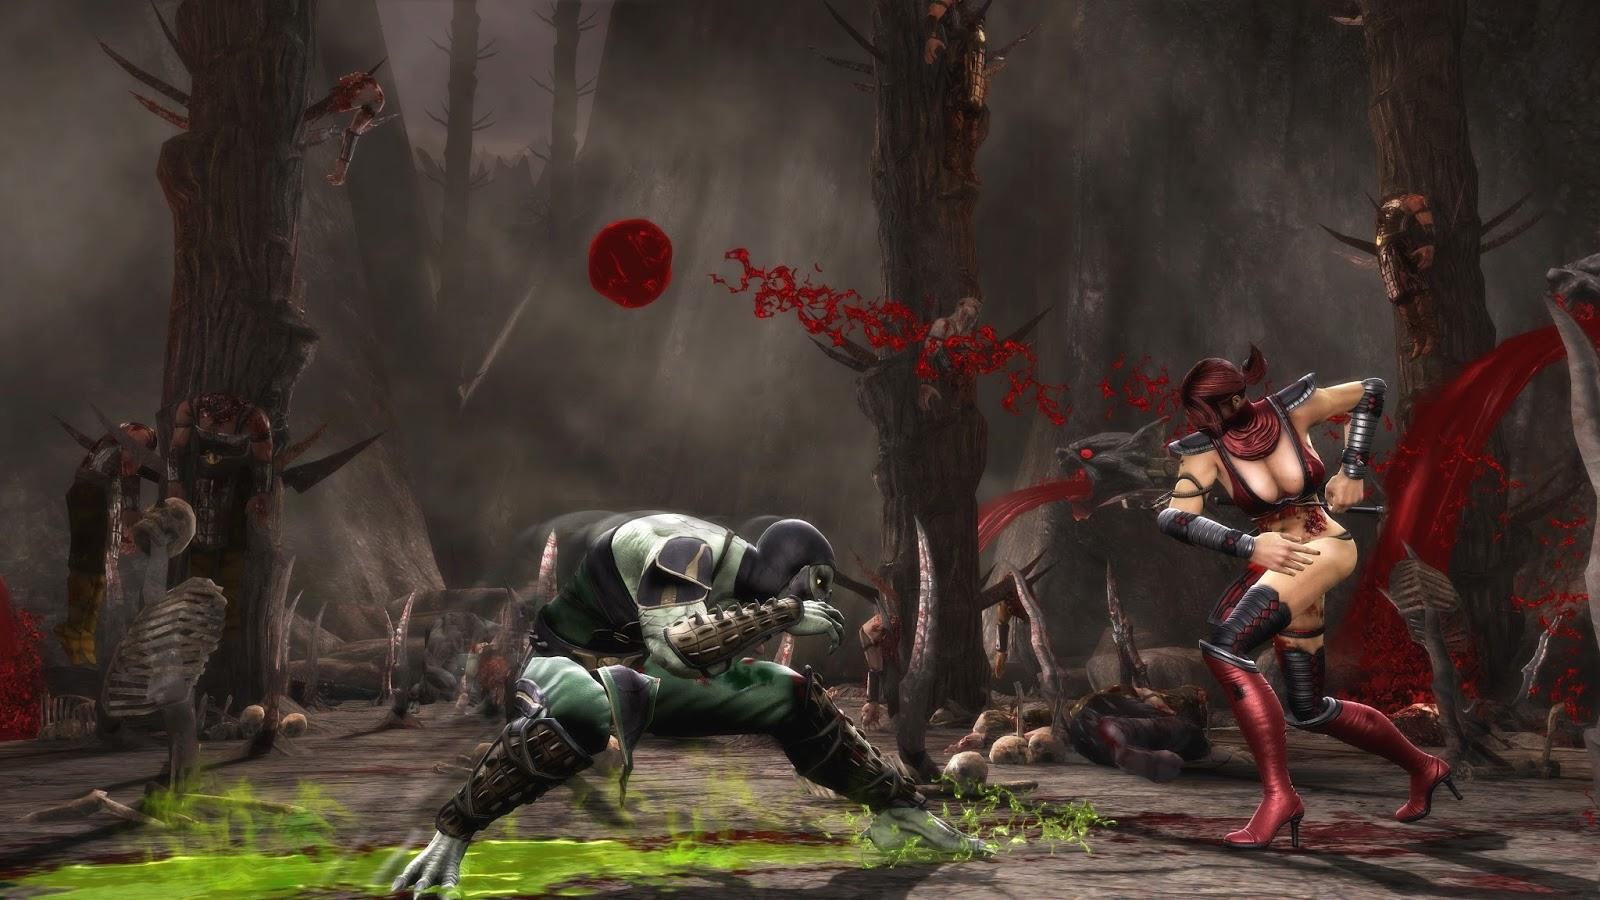 Mortal Kombat Komplete Edition Free Download - Vanish into Games